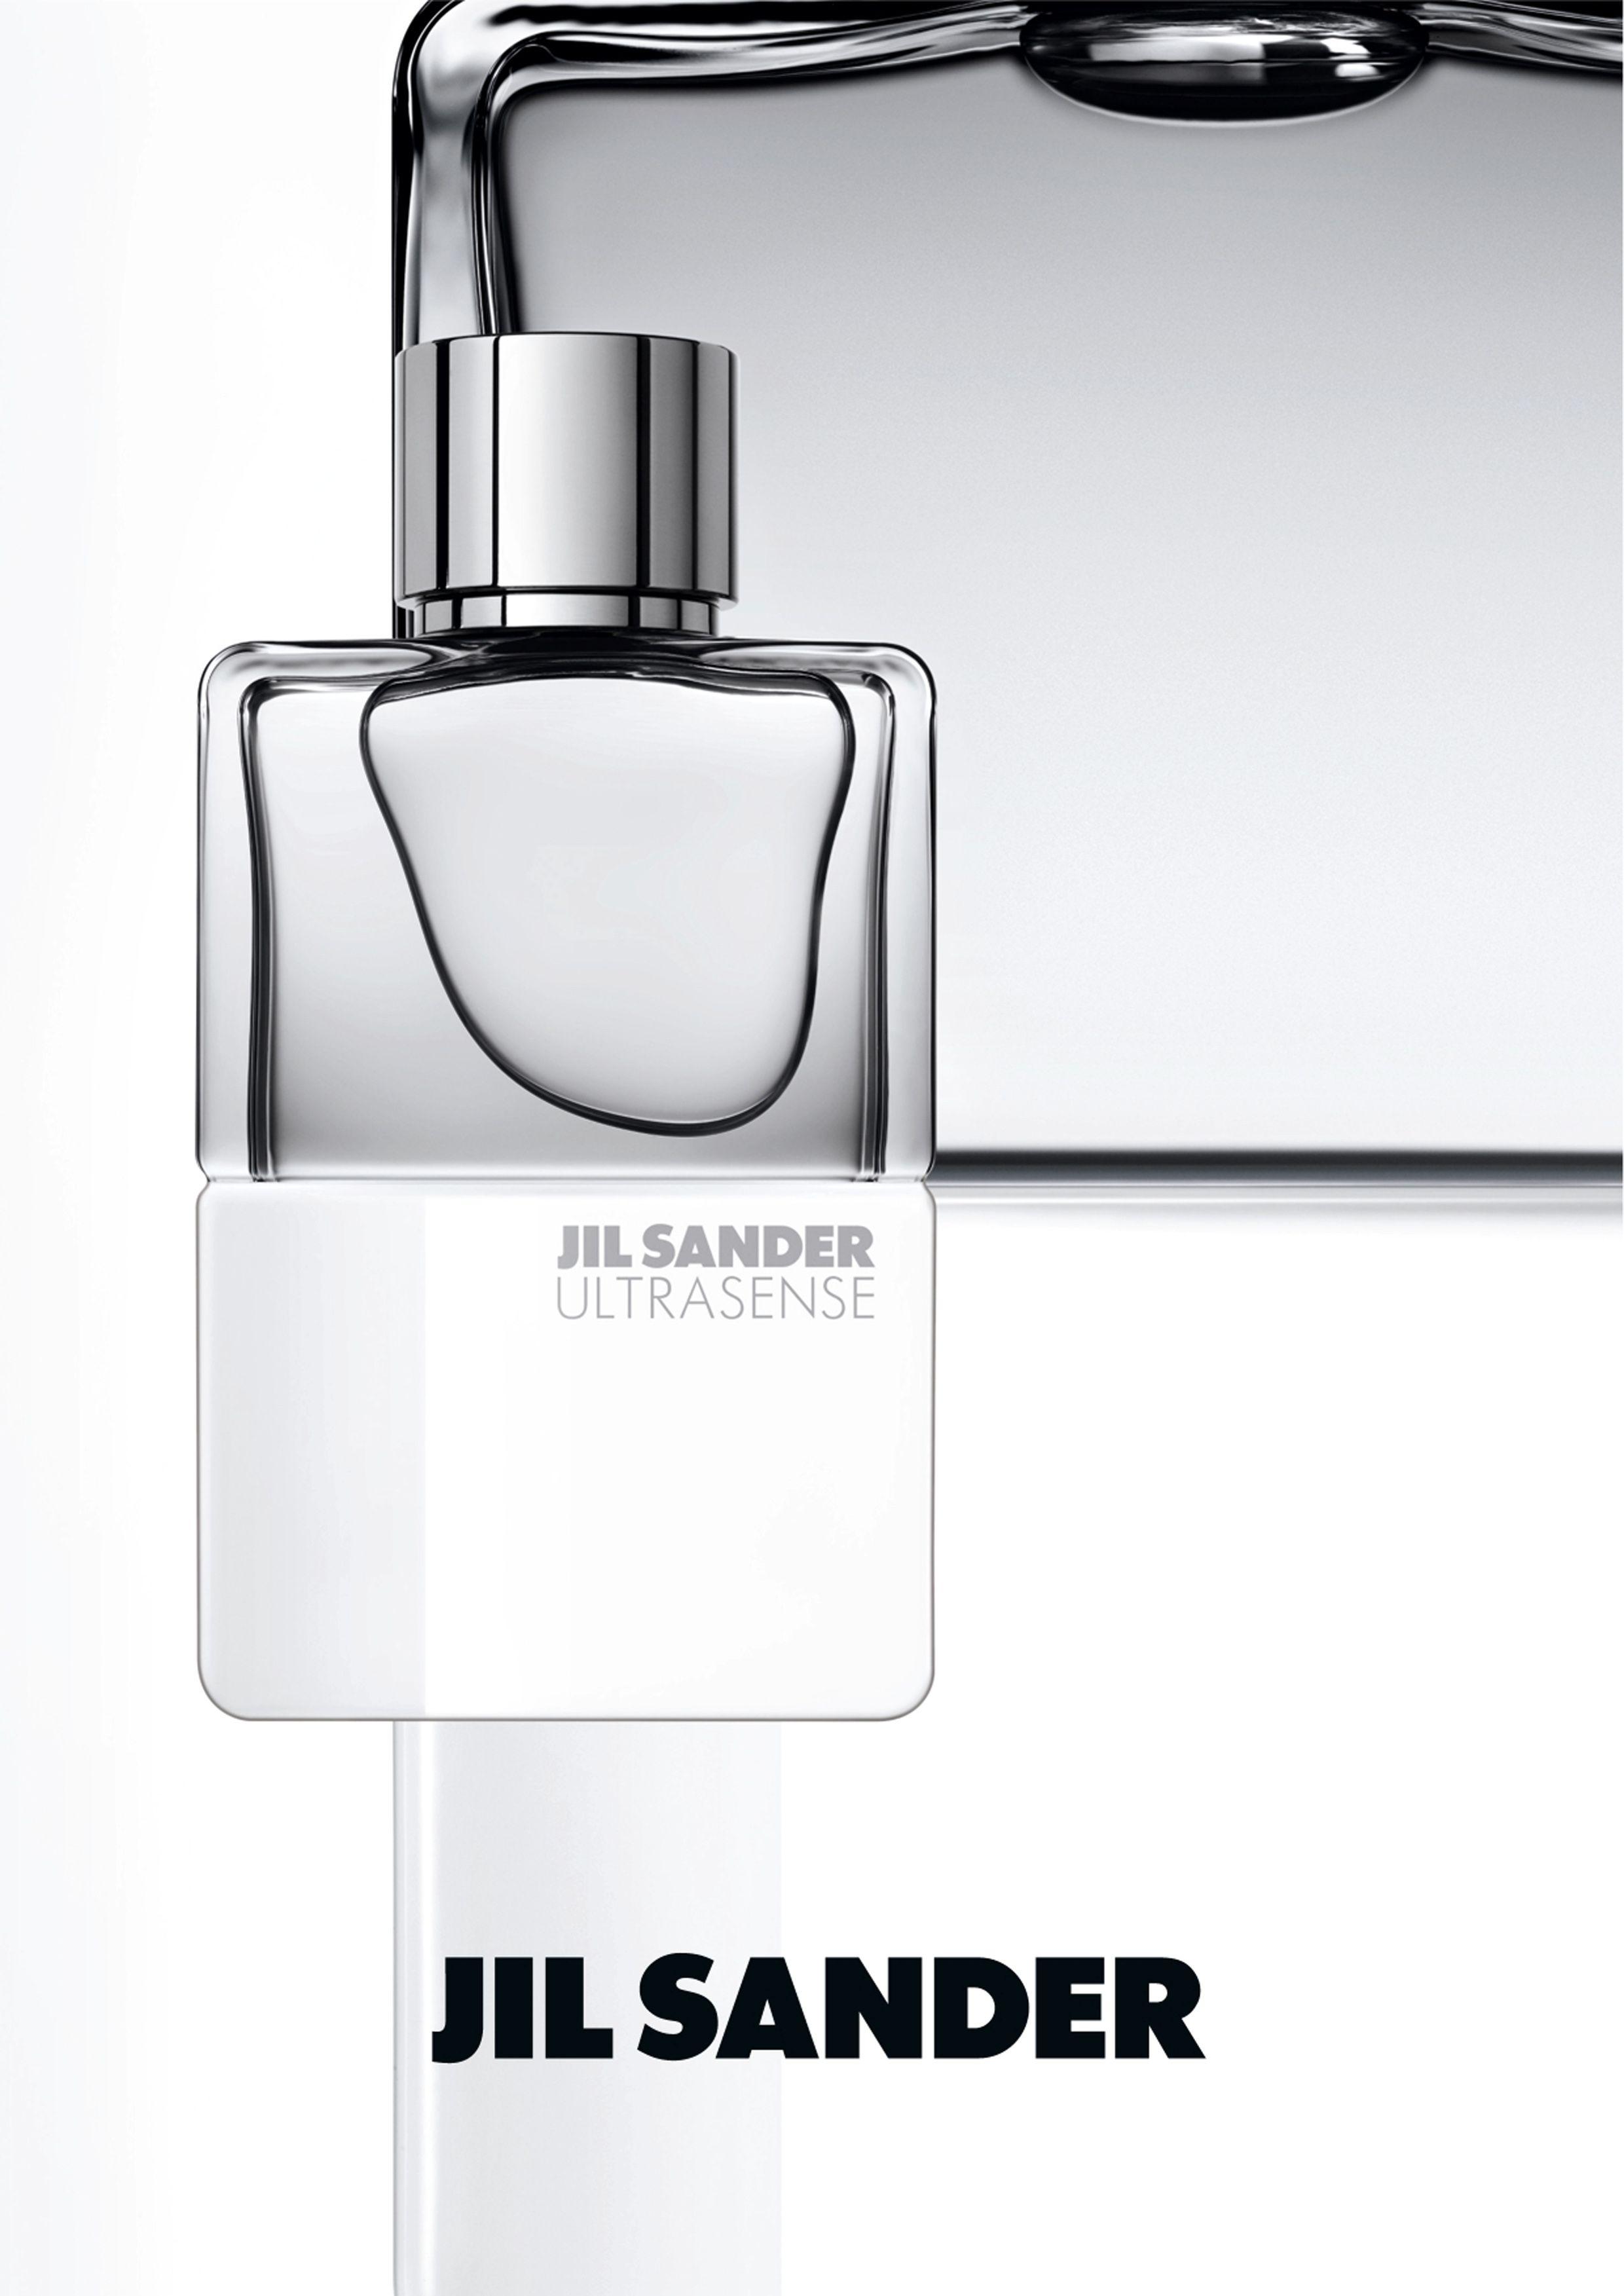 Ultrasense WhiteSmells AdPerfumeFragrance Sander Perfume Jil QeExBdCorW